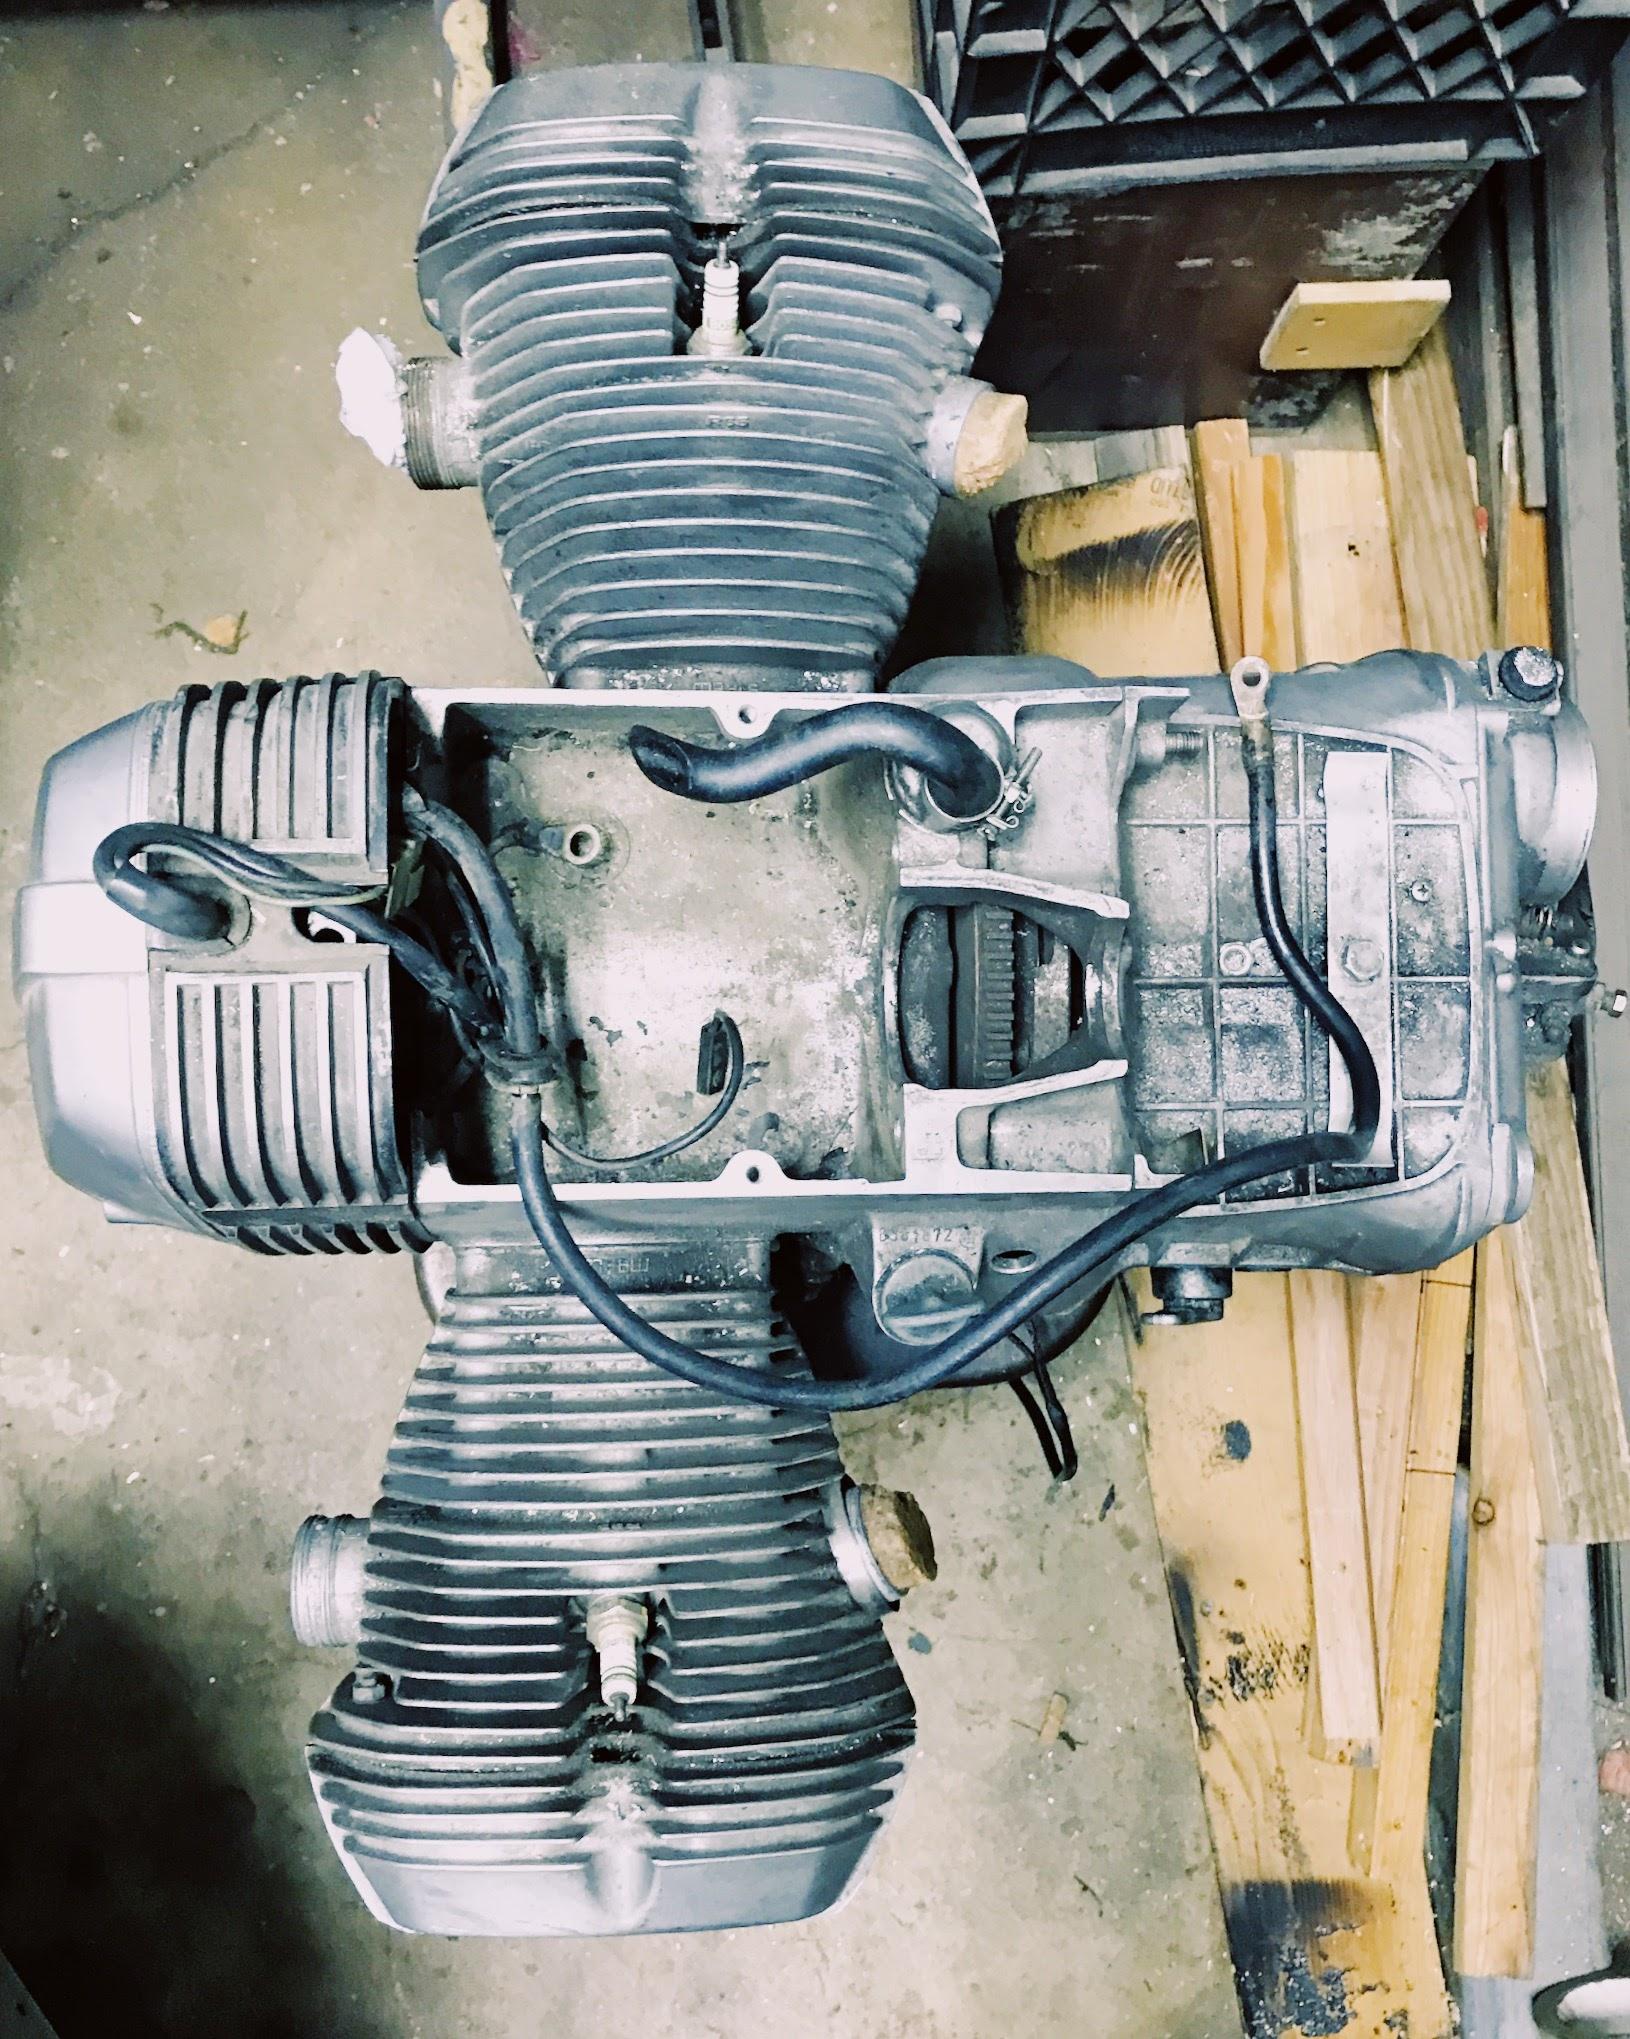 7EAADABC-8D15-4387-8B1B-BDA95669A8B6.jpg